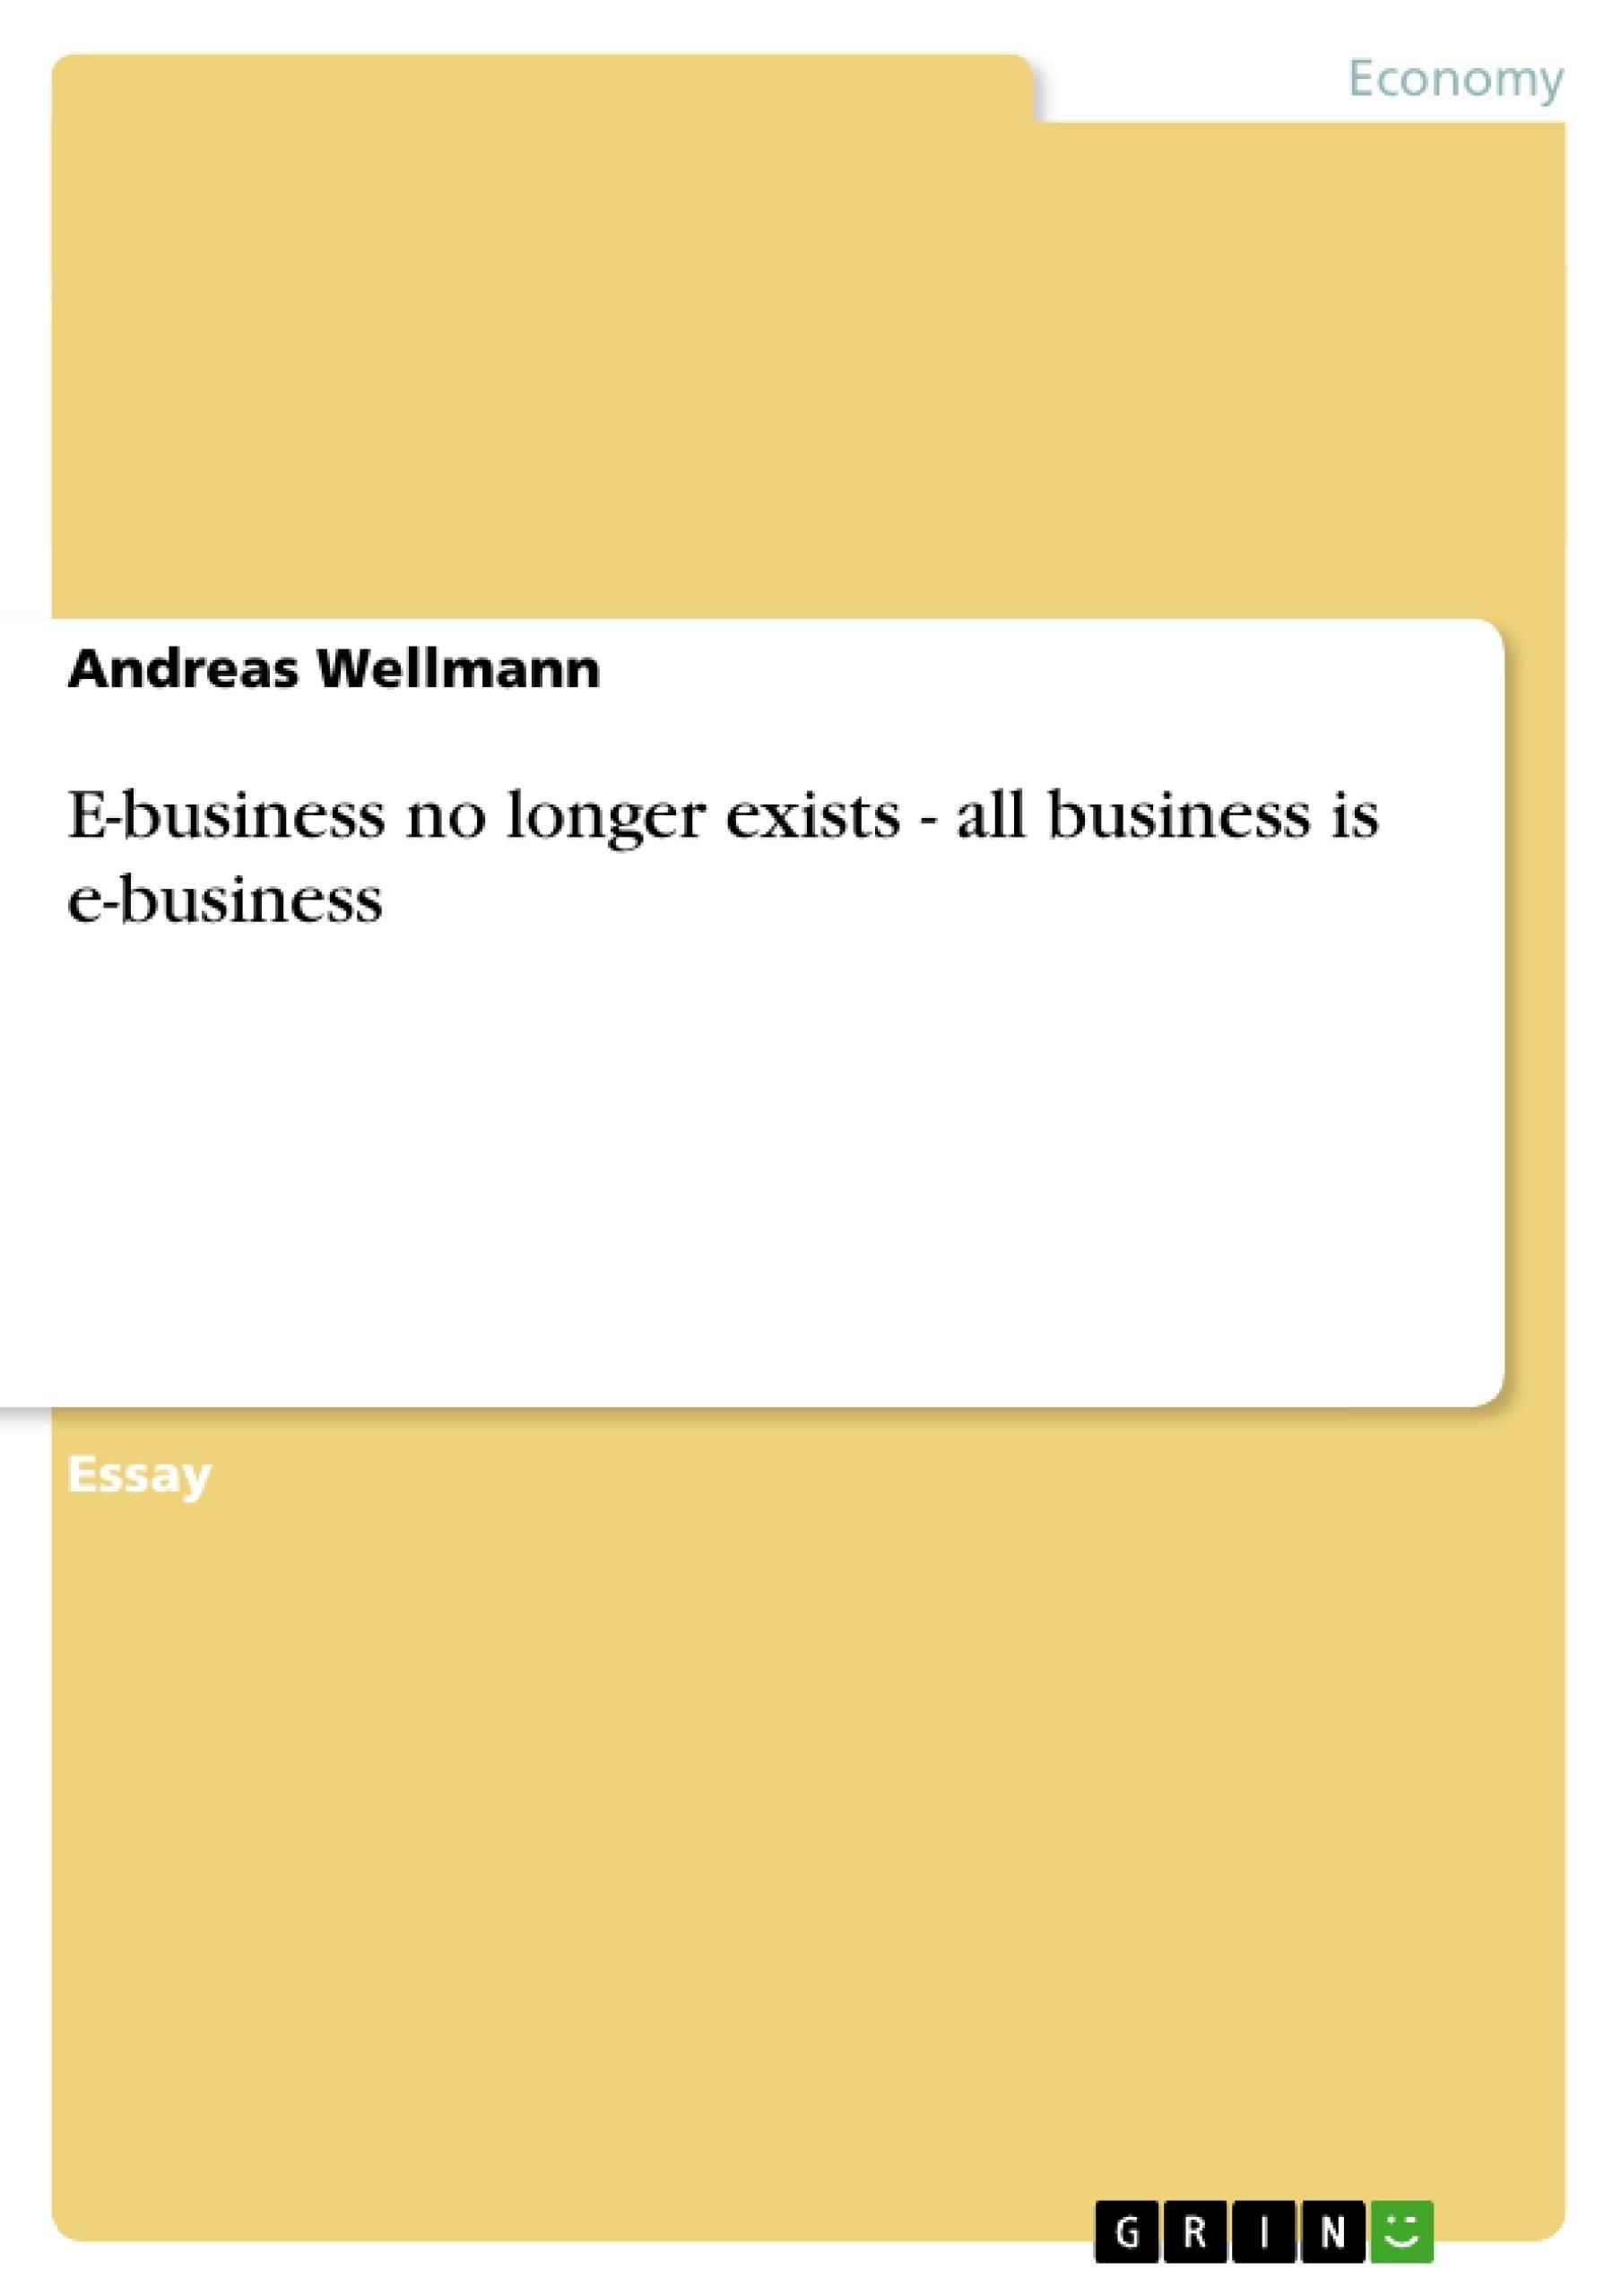 Title: E-business no longer exists - all business is e-business